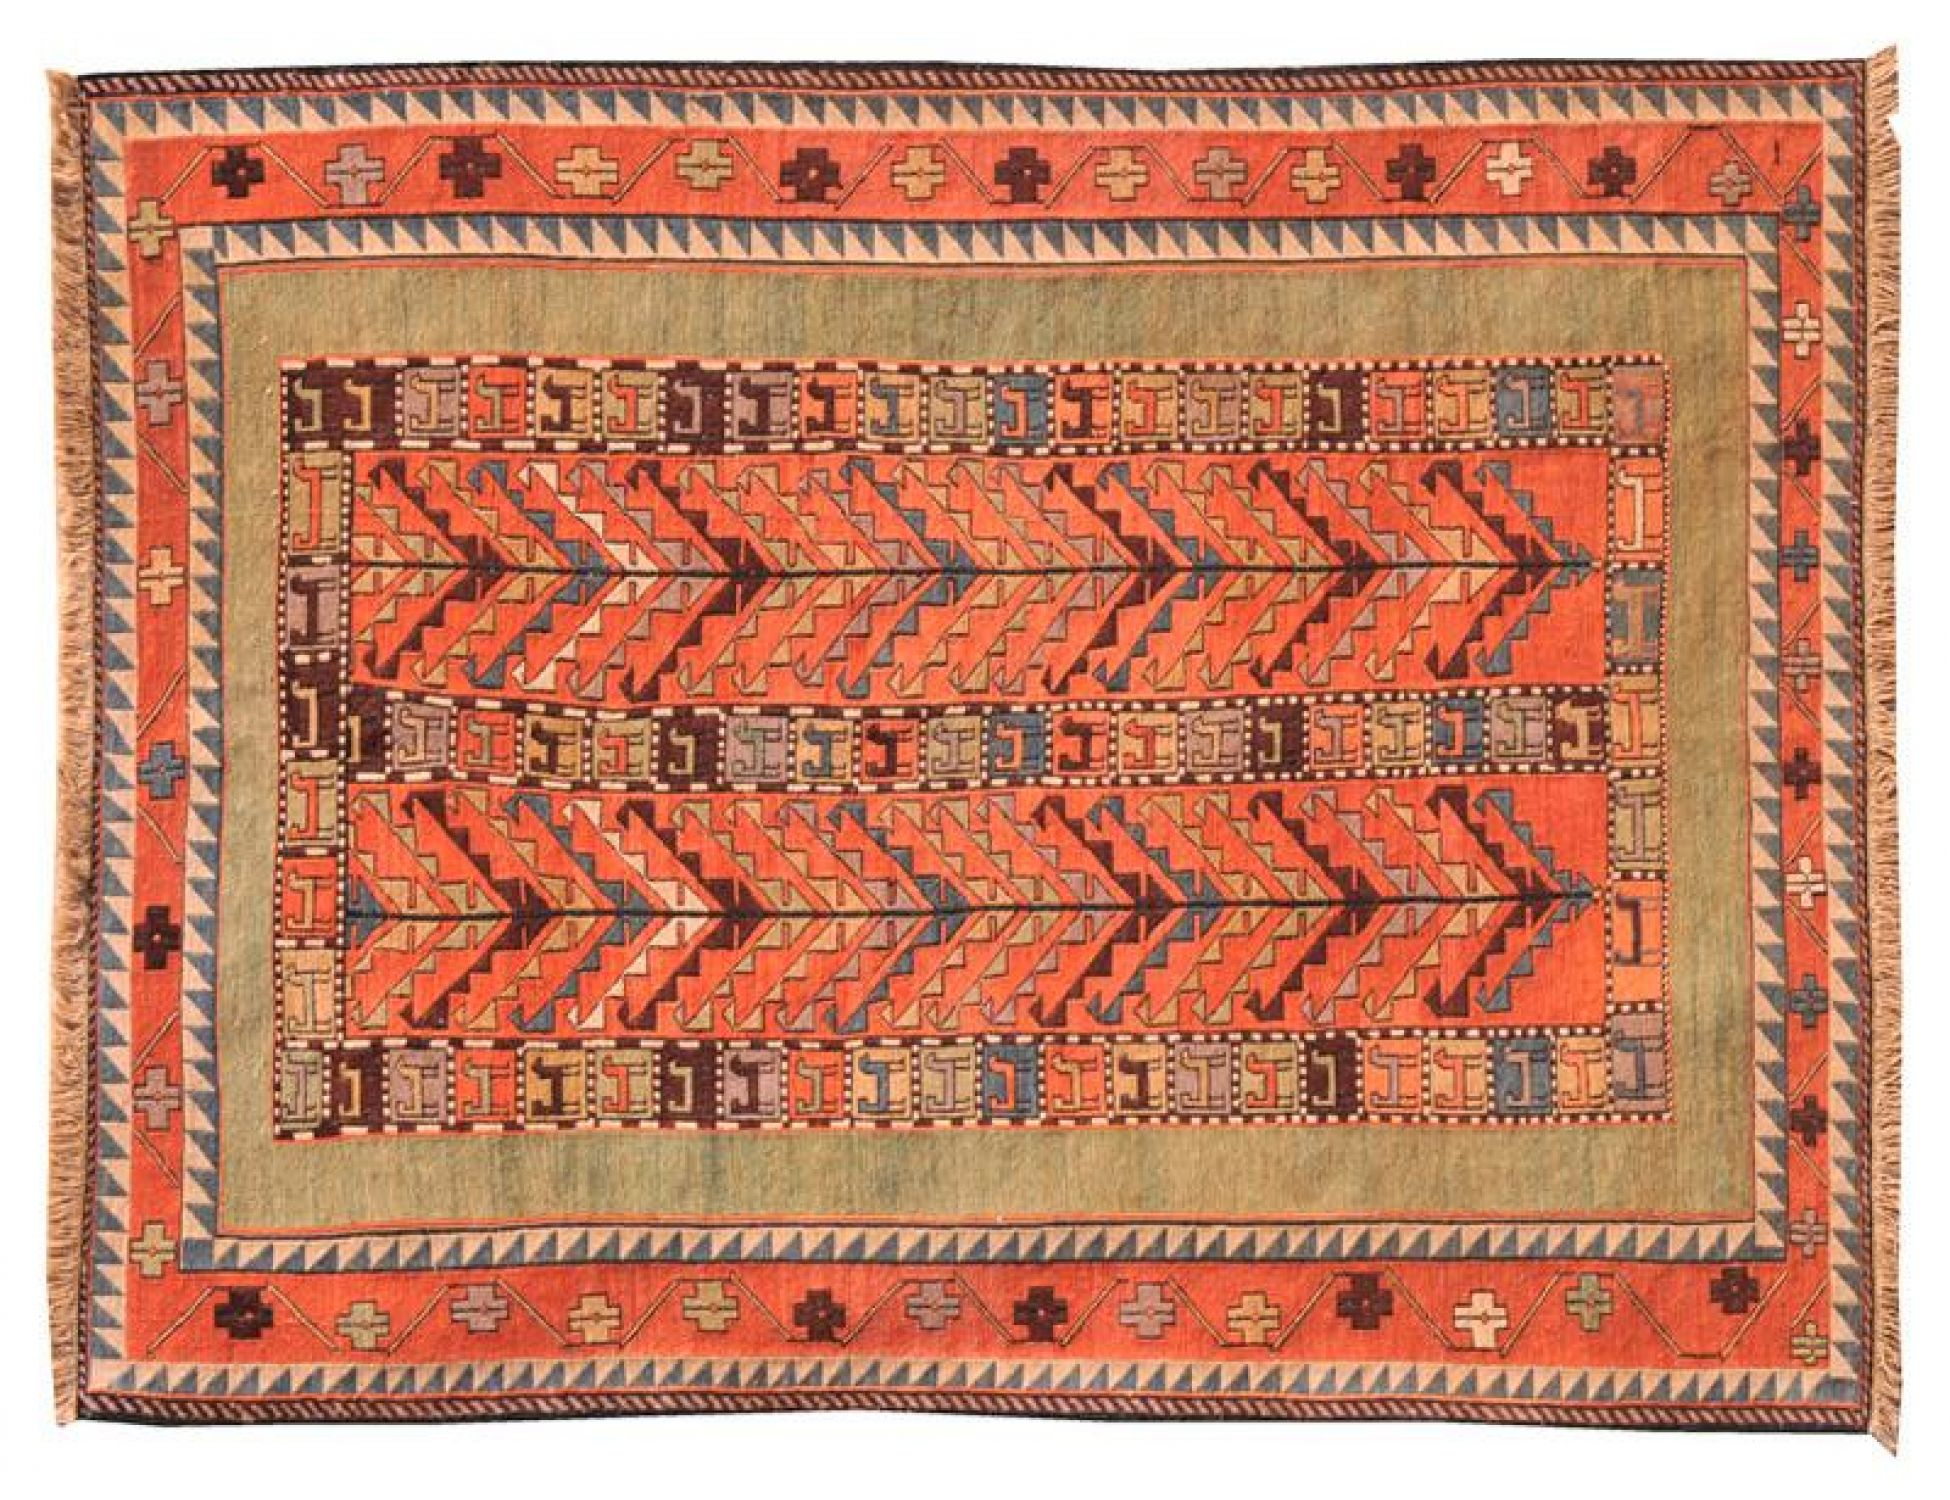 PERSIAN WOOL KILIMS   <br/>196 x 115 cm